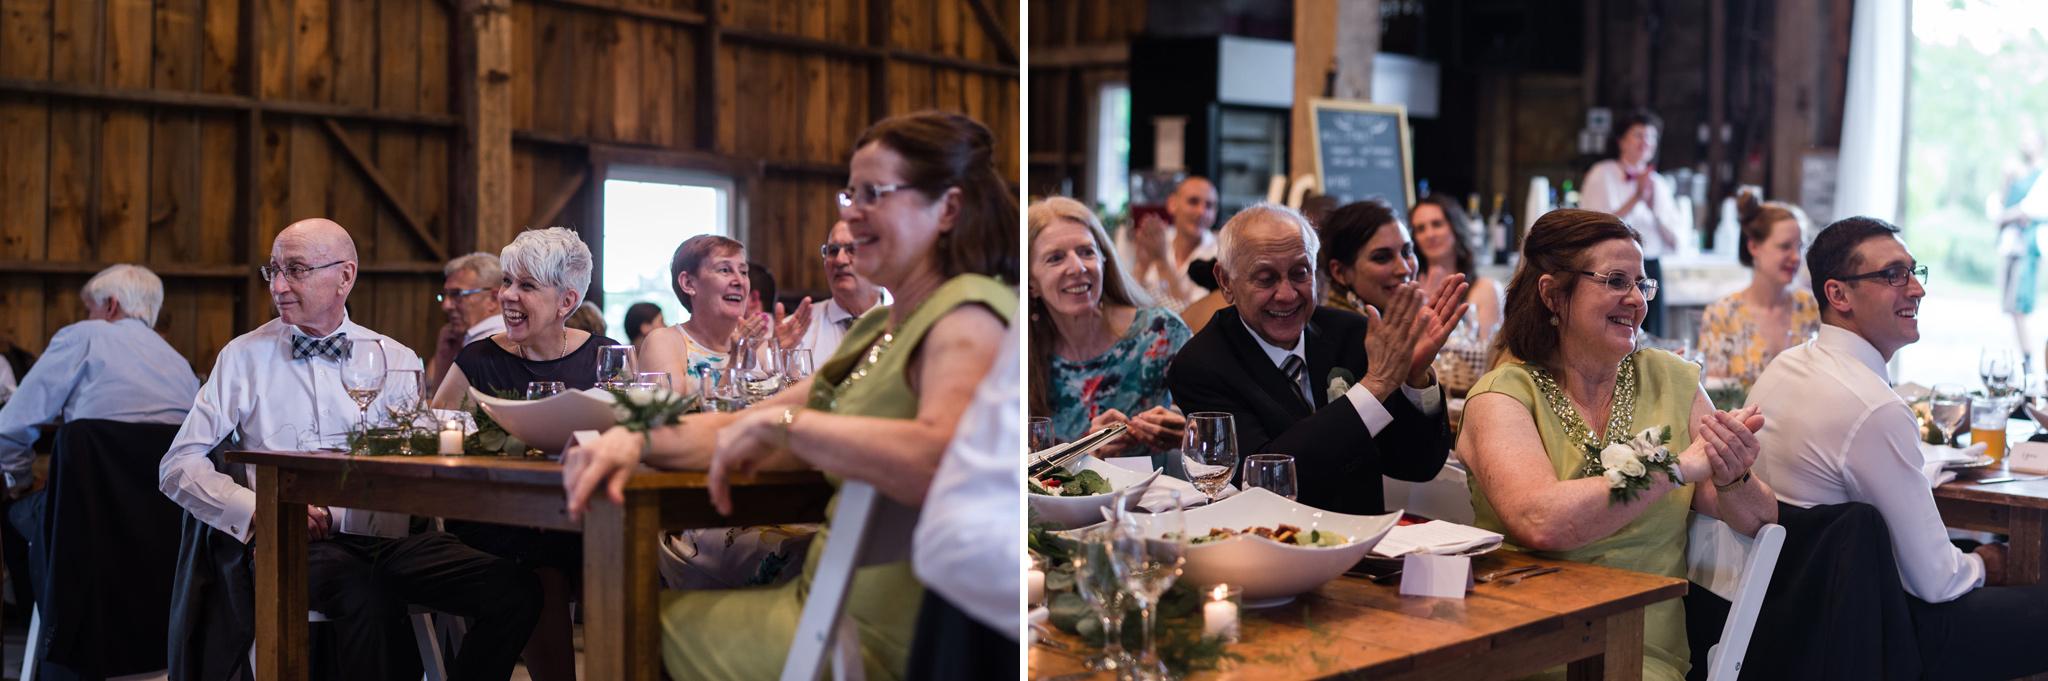 110-sydenham-ridge-wedding-barn-reception-toronto-photographer.jpg